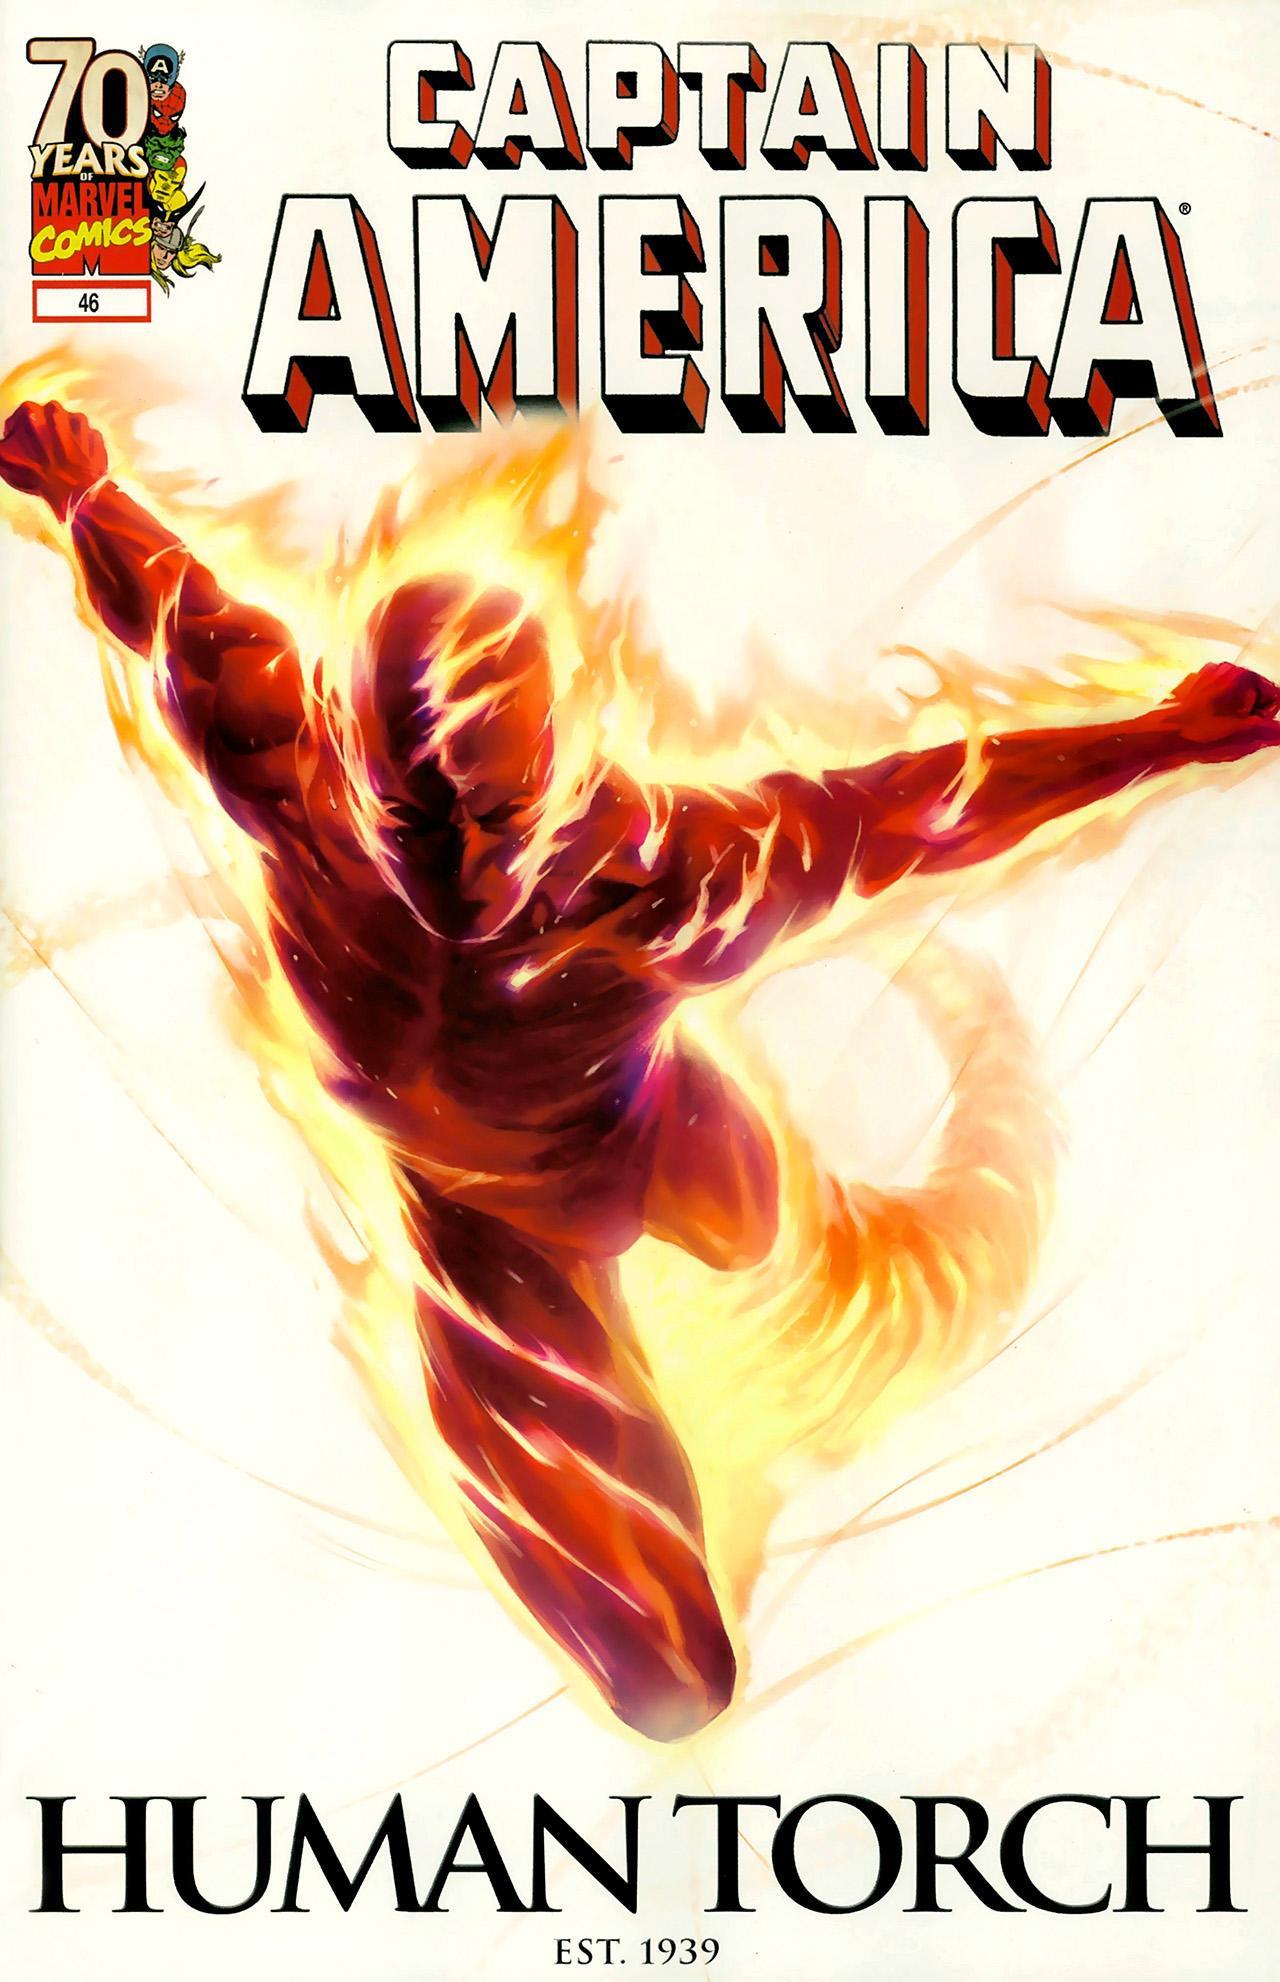 Captain America Vol 5 46 70th Anniversary Variant.jpg